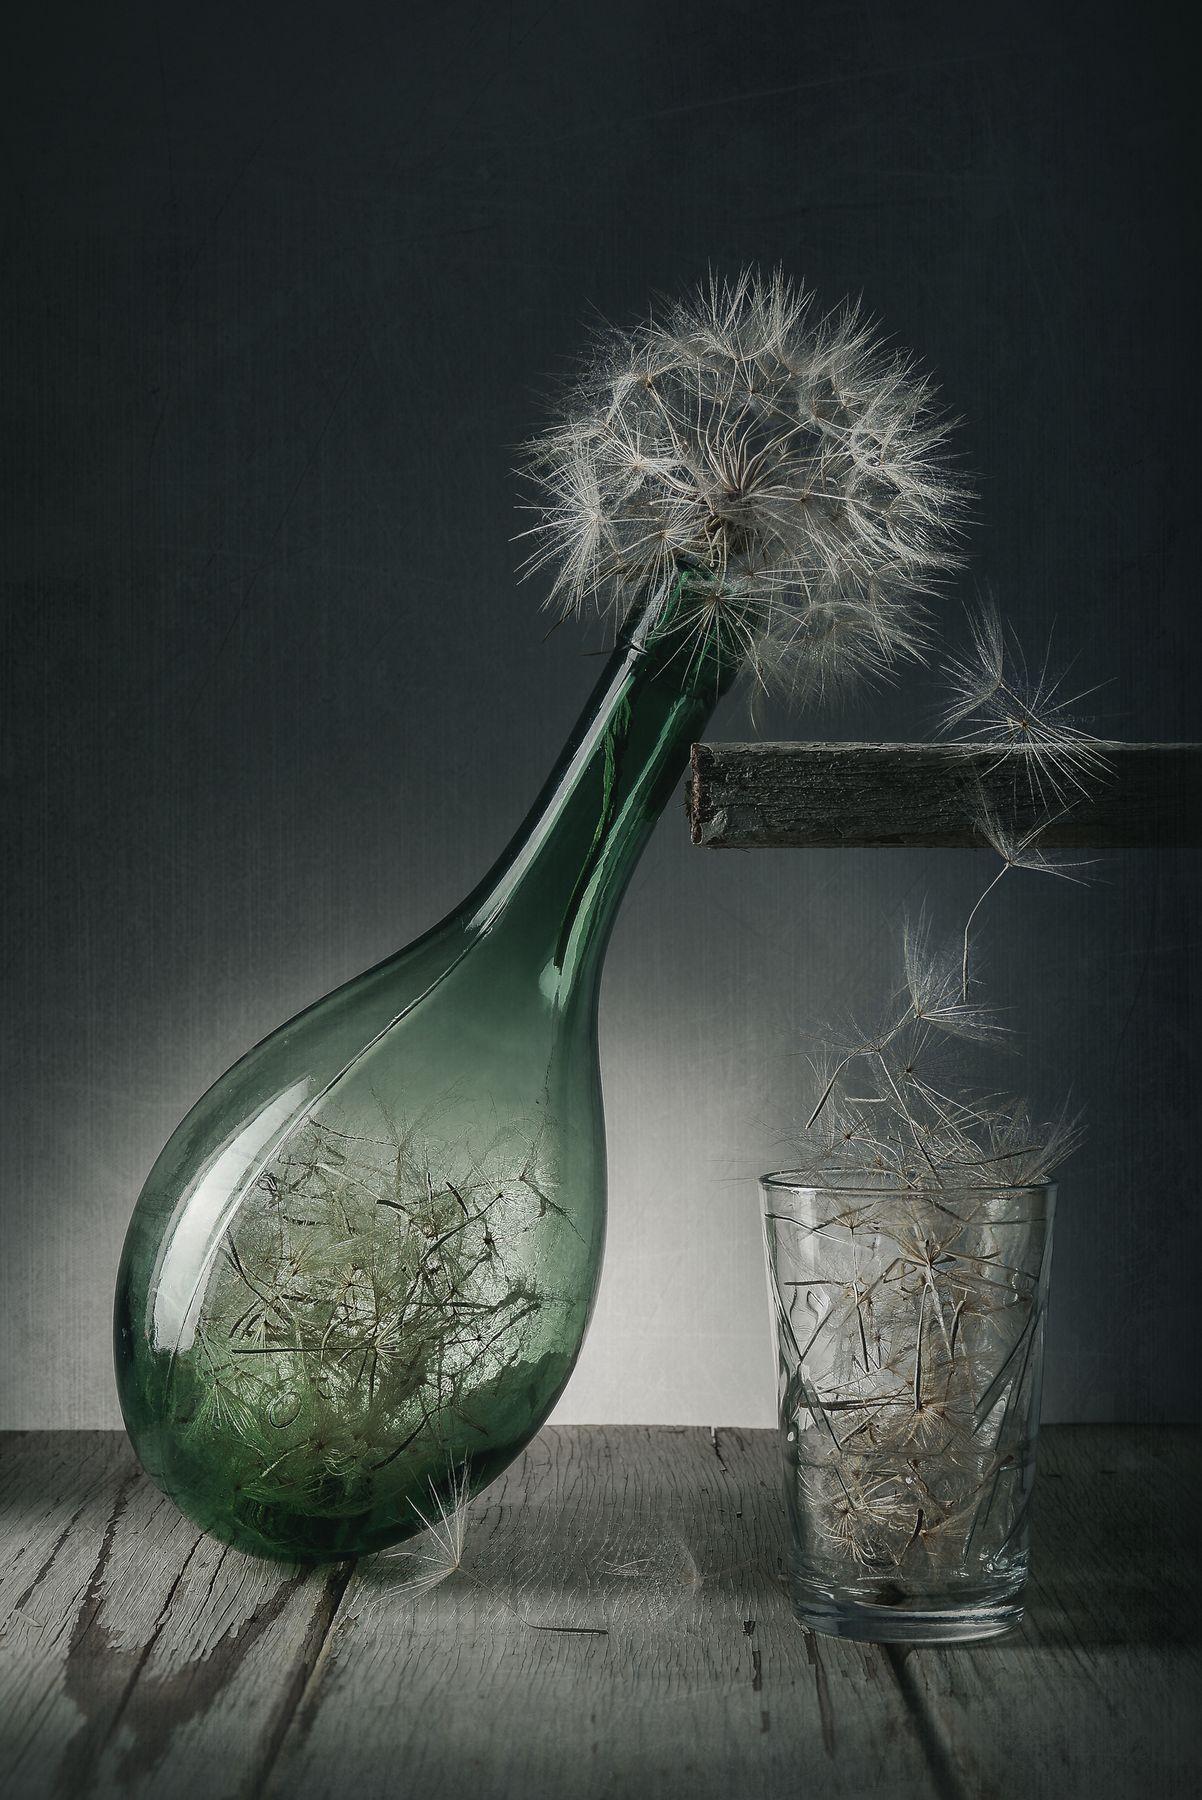 Вино из одуванчиков 2. Натюрморт стекло на просвет одуванчики низкий ключ